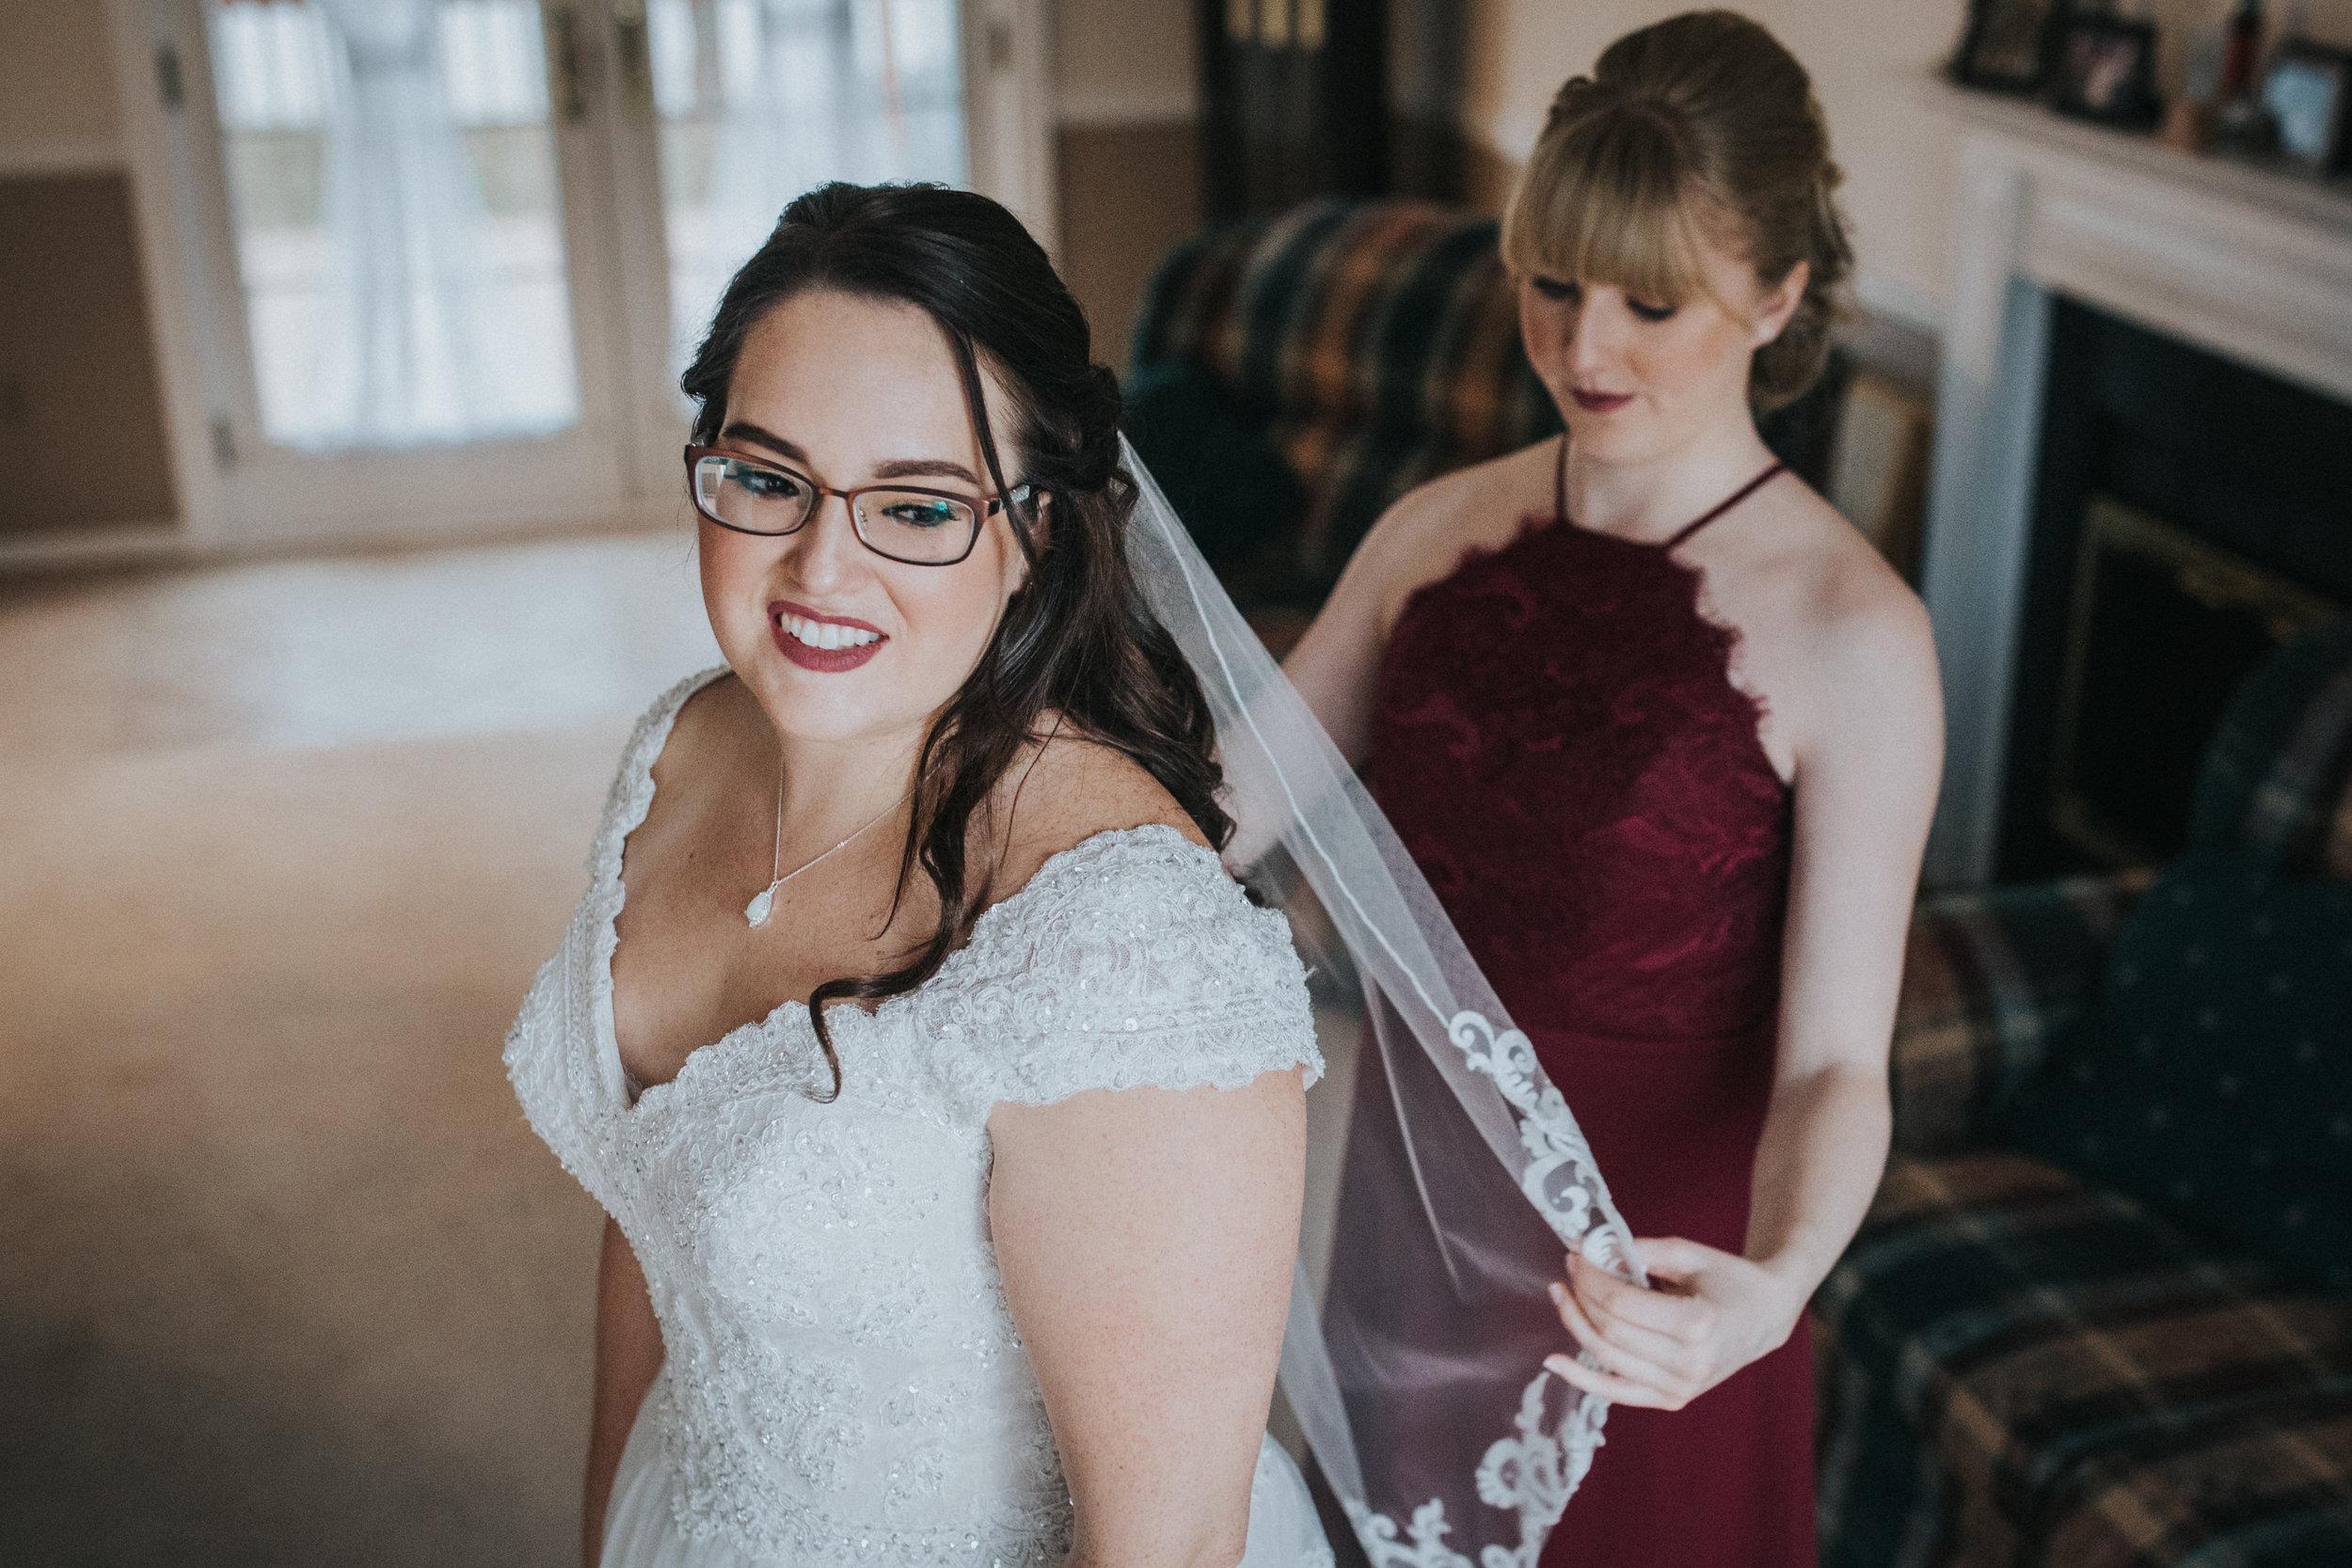 New-Jersey-Wedding-Photography-Fishers-Tudor-House-JennaLynnPhotography-Getting-Ready-Kathleen&Eddie-69.jpg